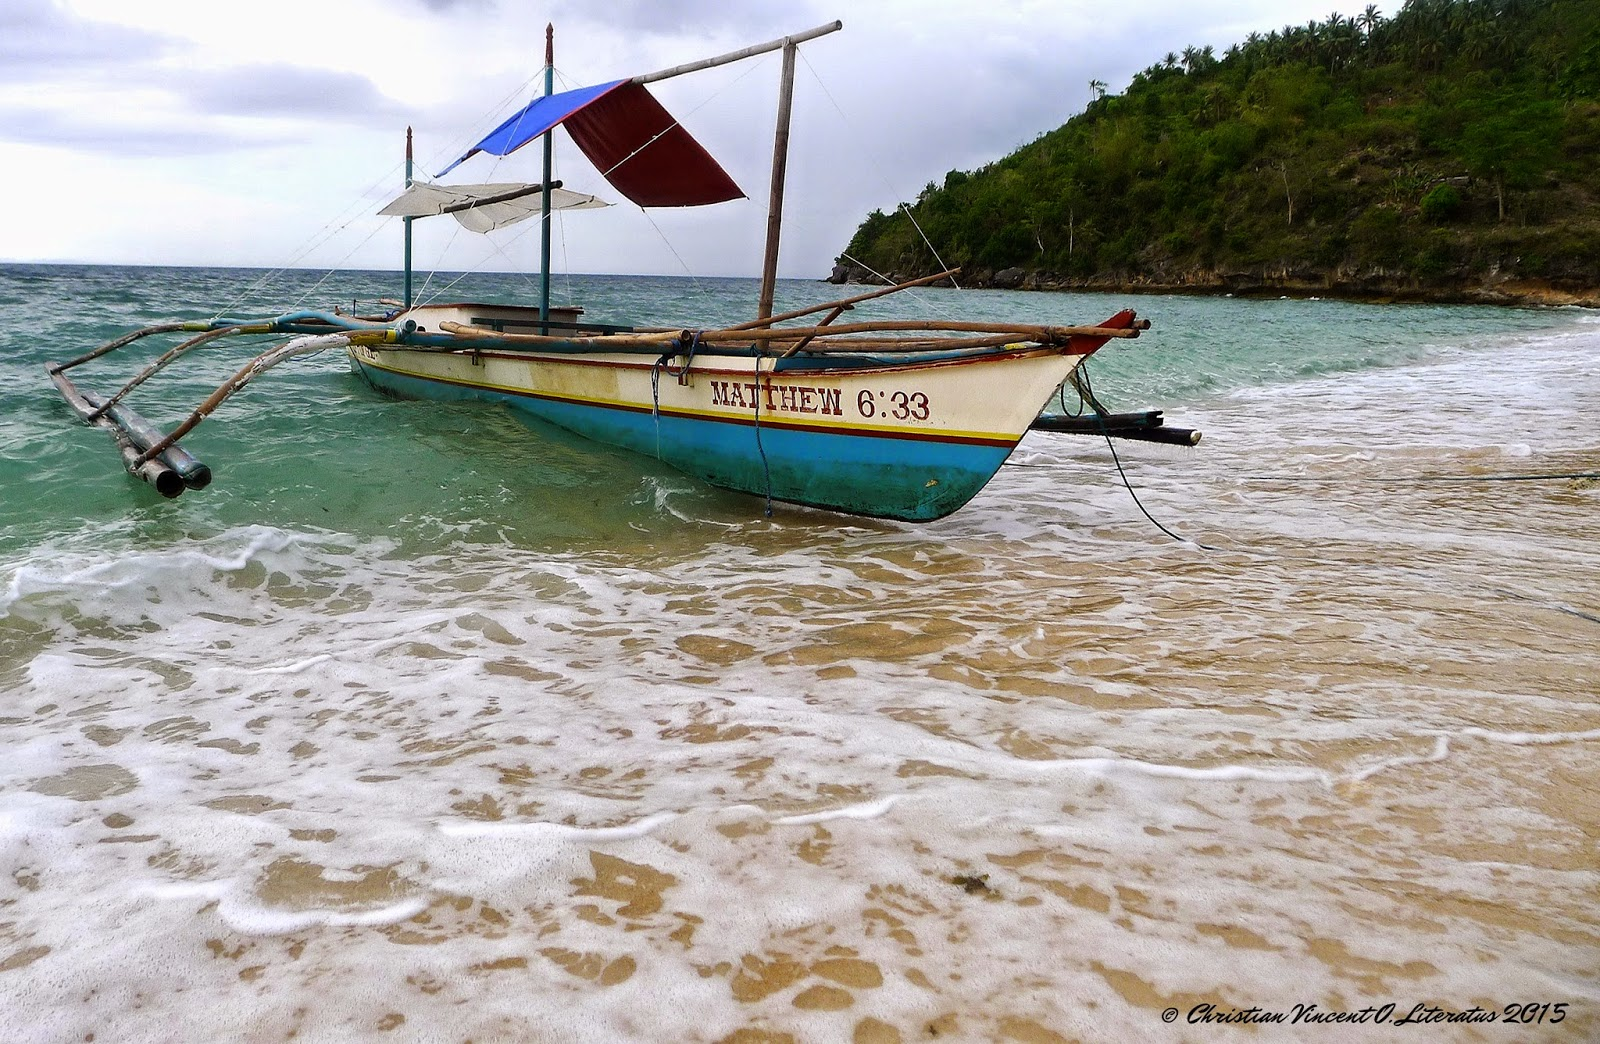 PHILIPPINEN REISEN - ORTE - CEBU - Aloguinsan